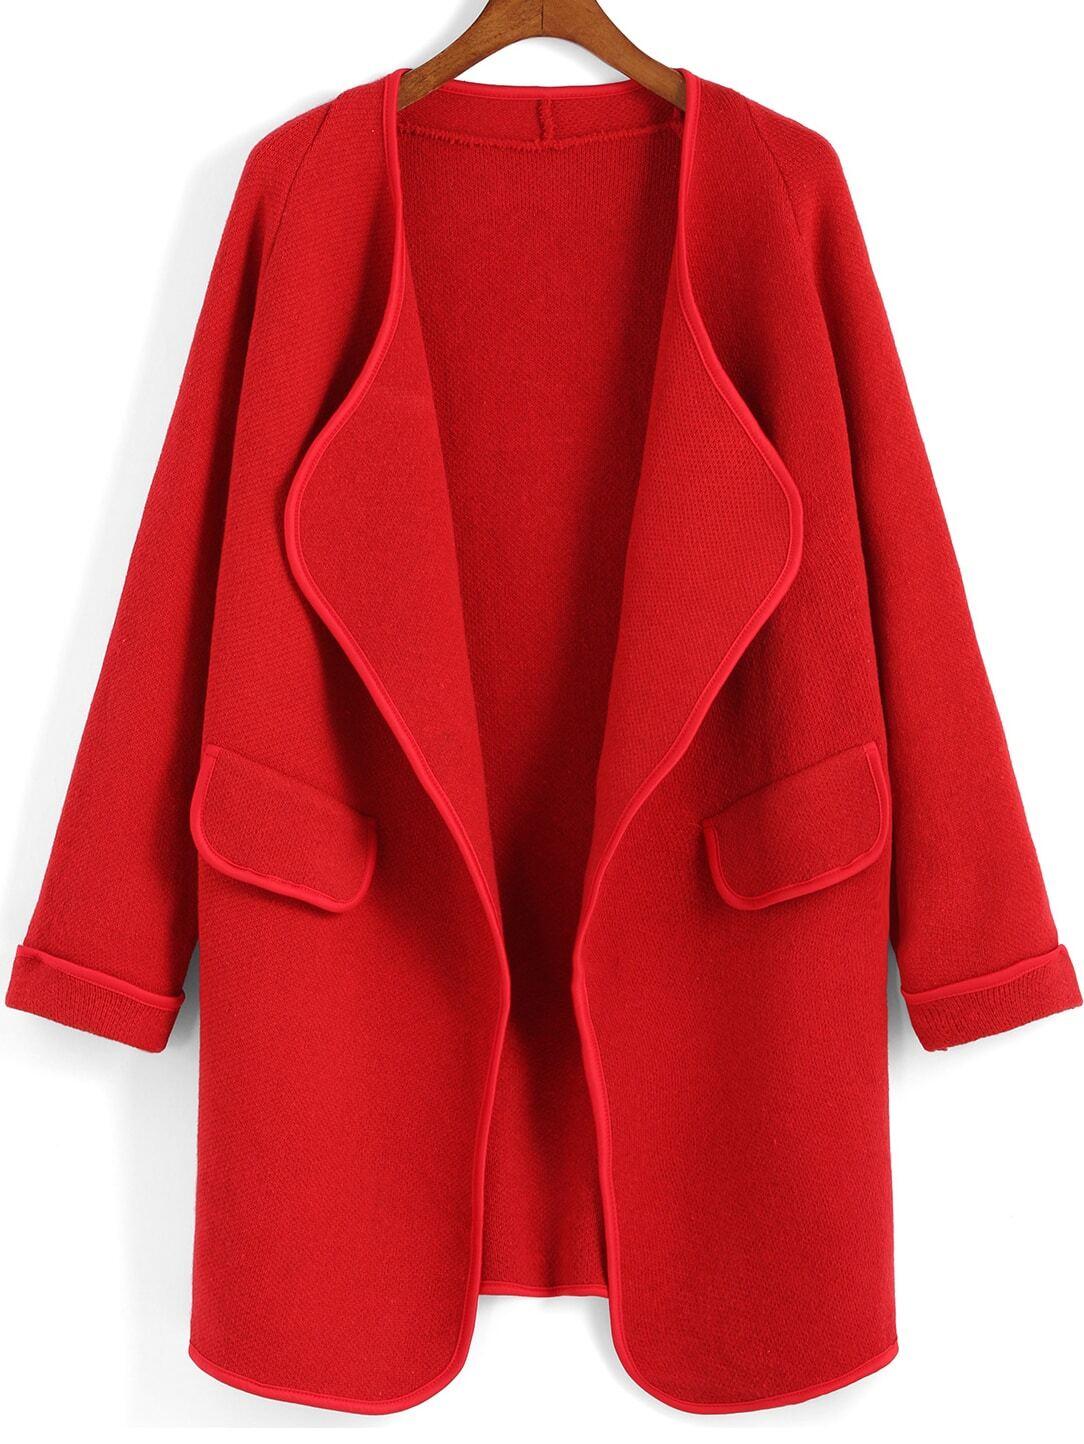 Red Long Sleeve Peplum Trims Sweater Coat -SheIn(Sheinside)